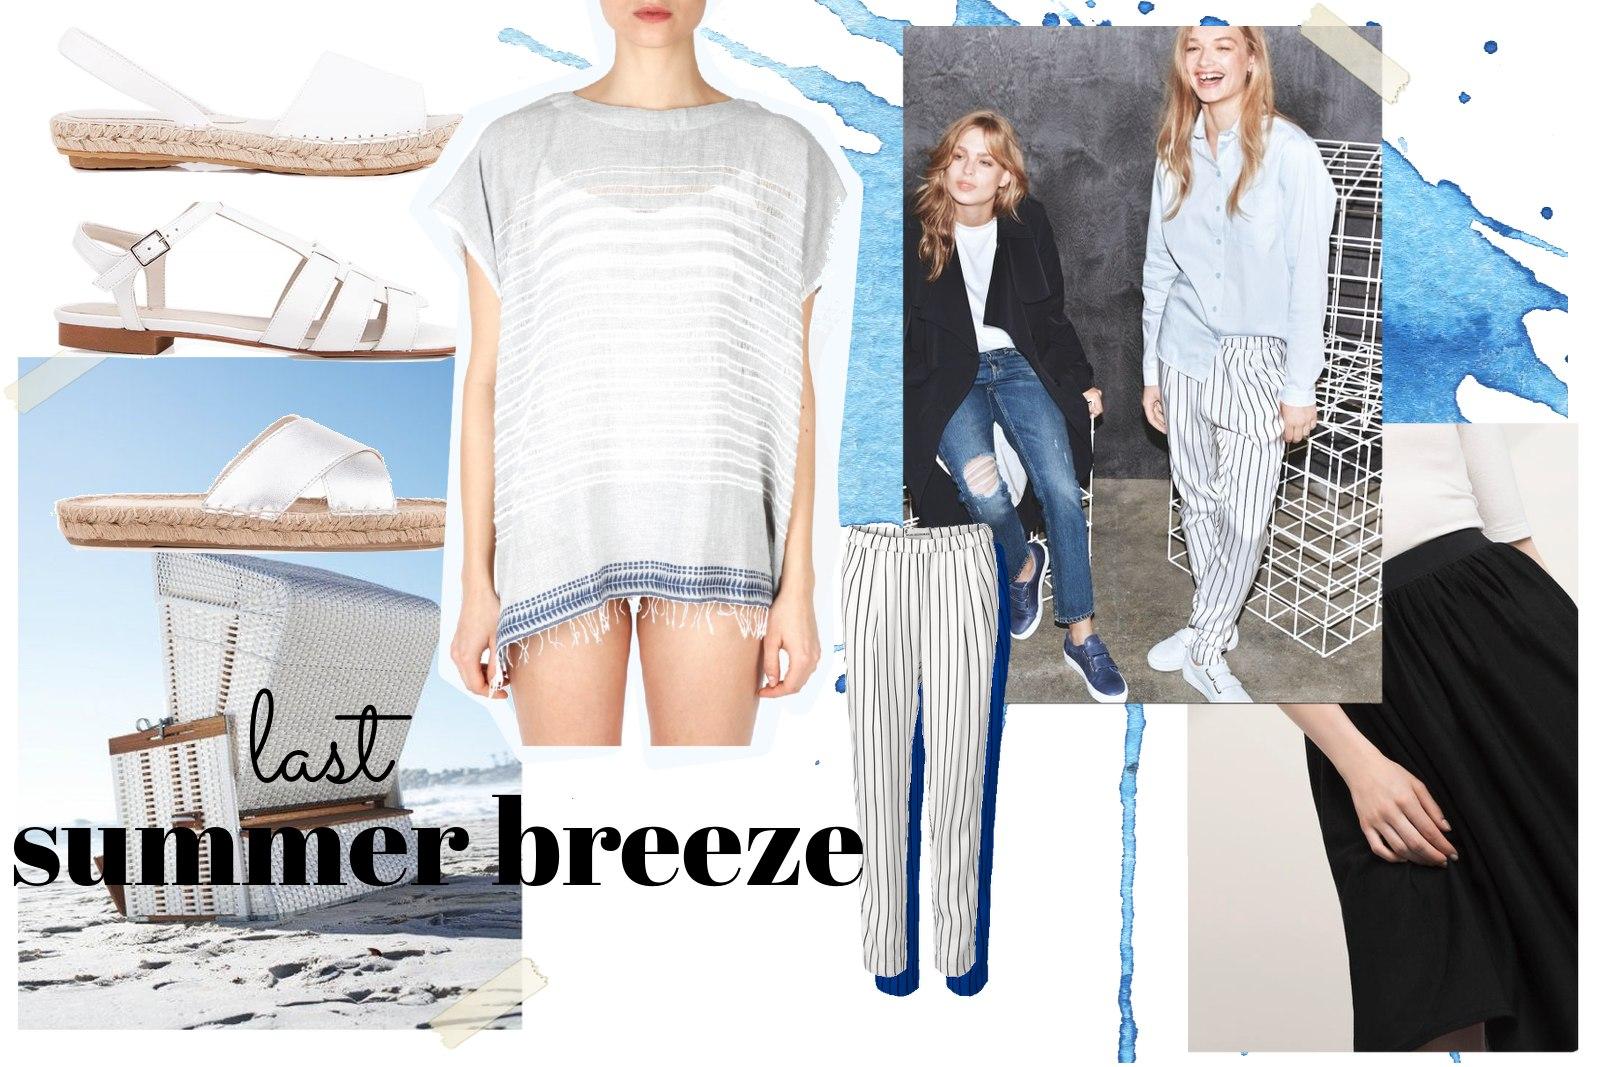 last summer breeze-fair fashion-slowfashion-inspo - last summerbreeze - fair fashion sommer outfit inspiration